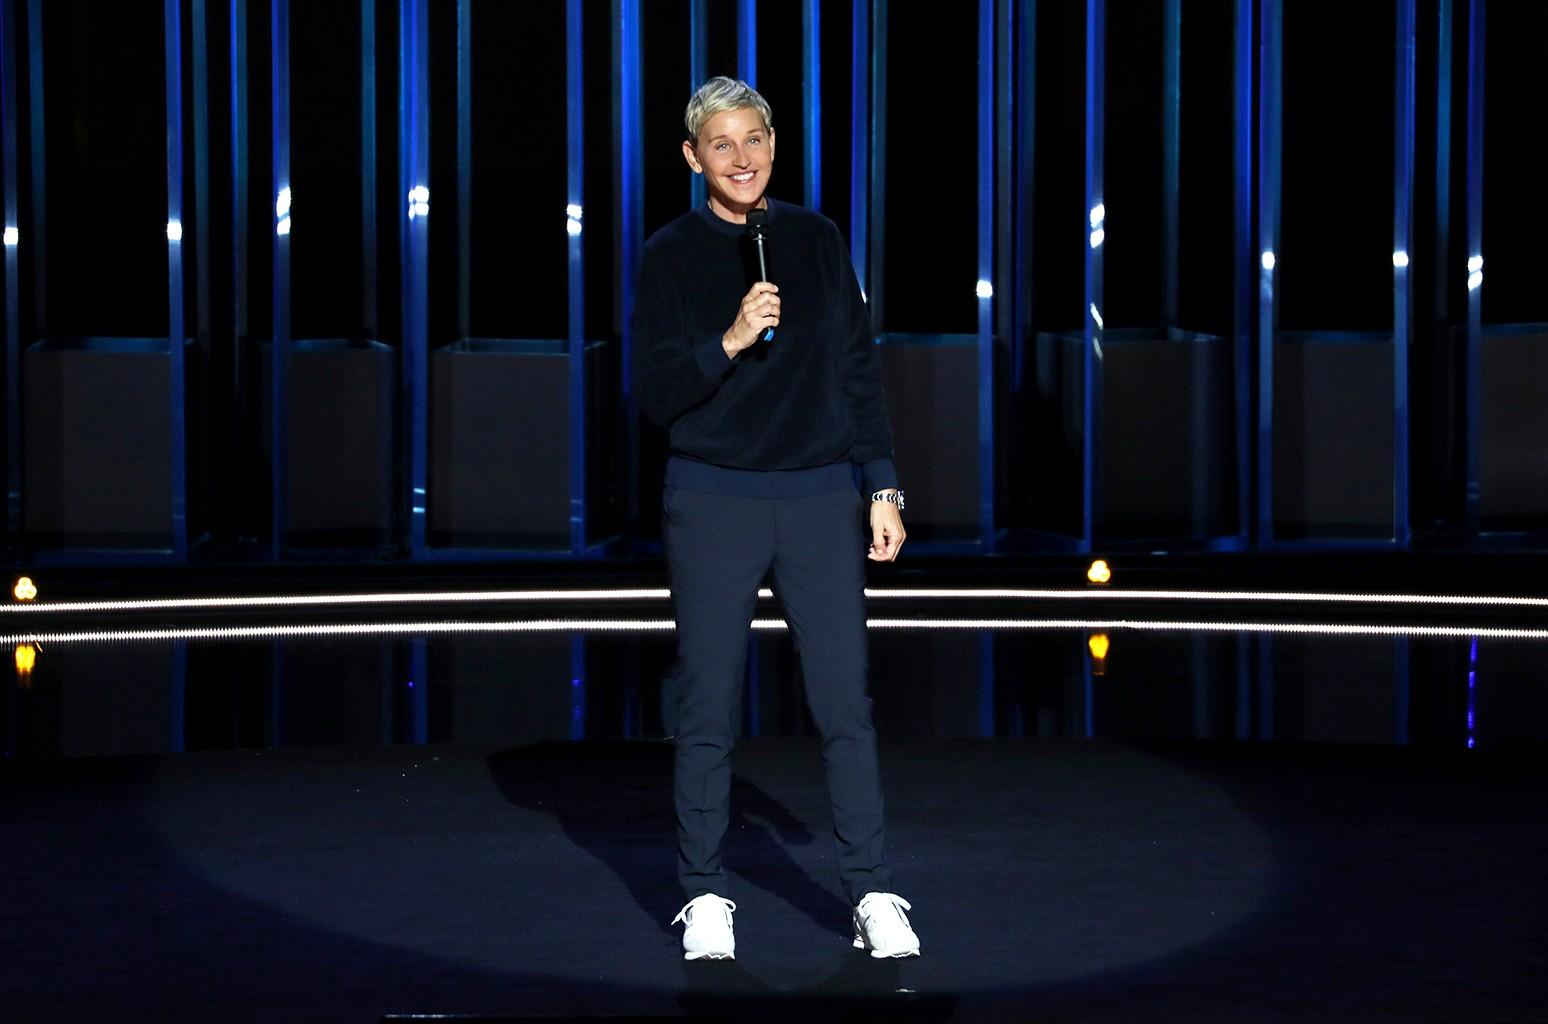 Ellen DeGeneres: Relatable - Production Stills - 001